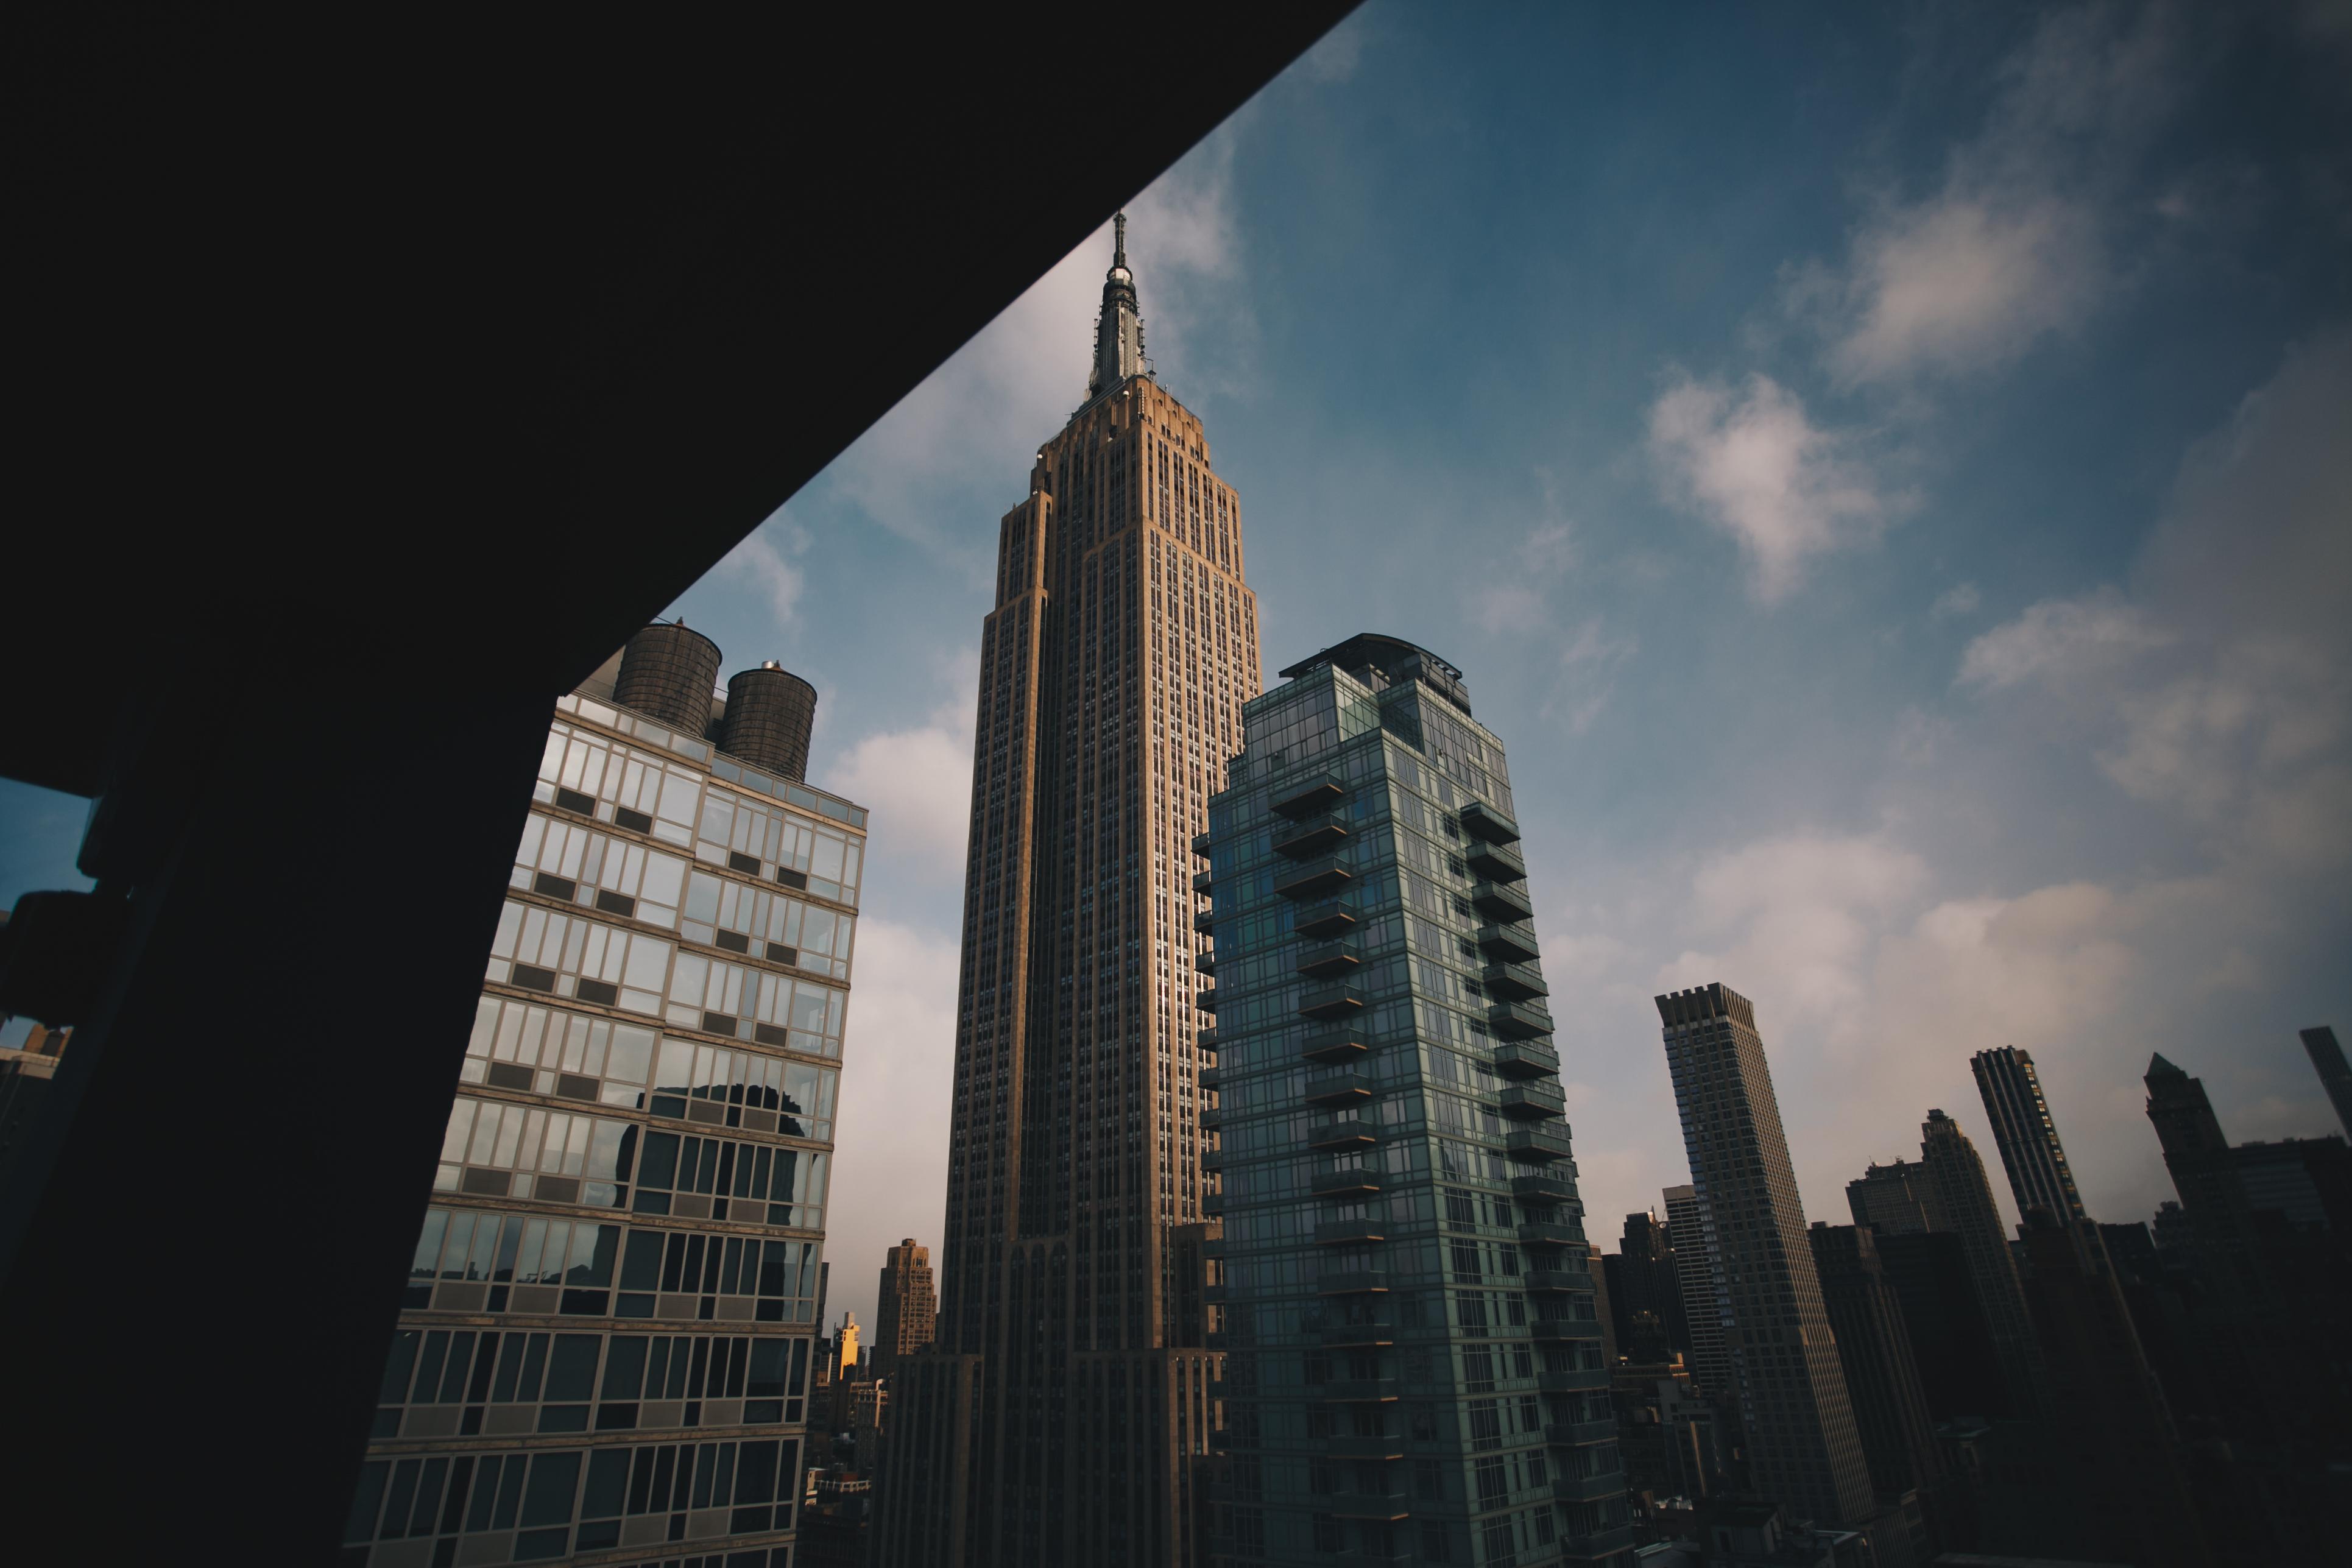 High-rise Concrete Builidngs Under Blue Sky